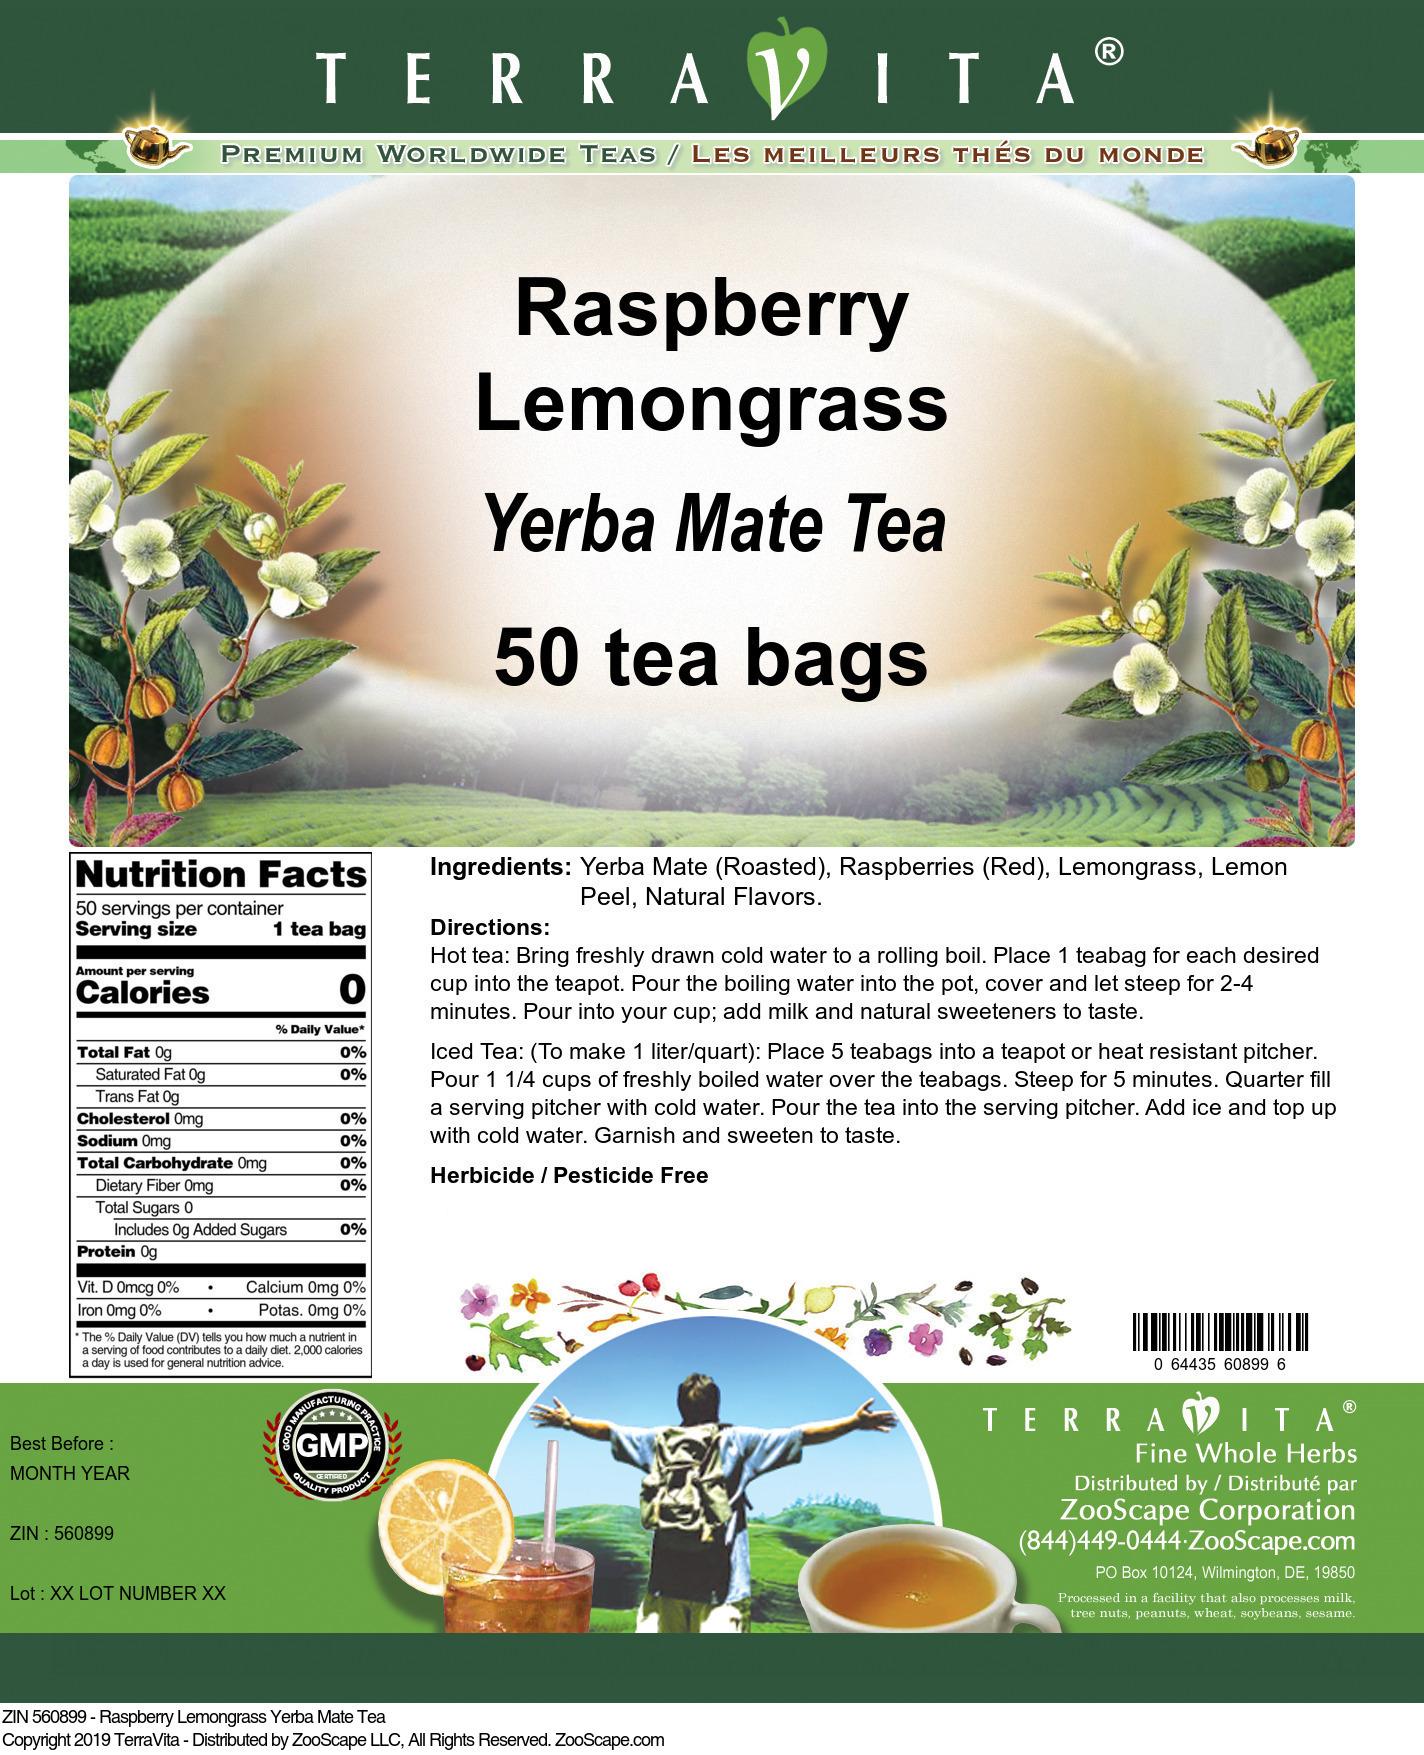 Raspberry Lemongrass Yerba Mate